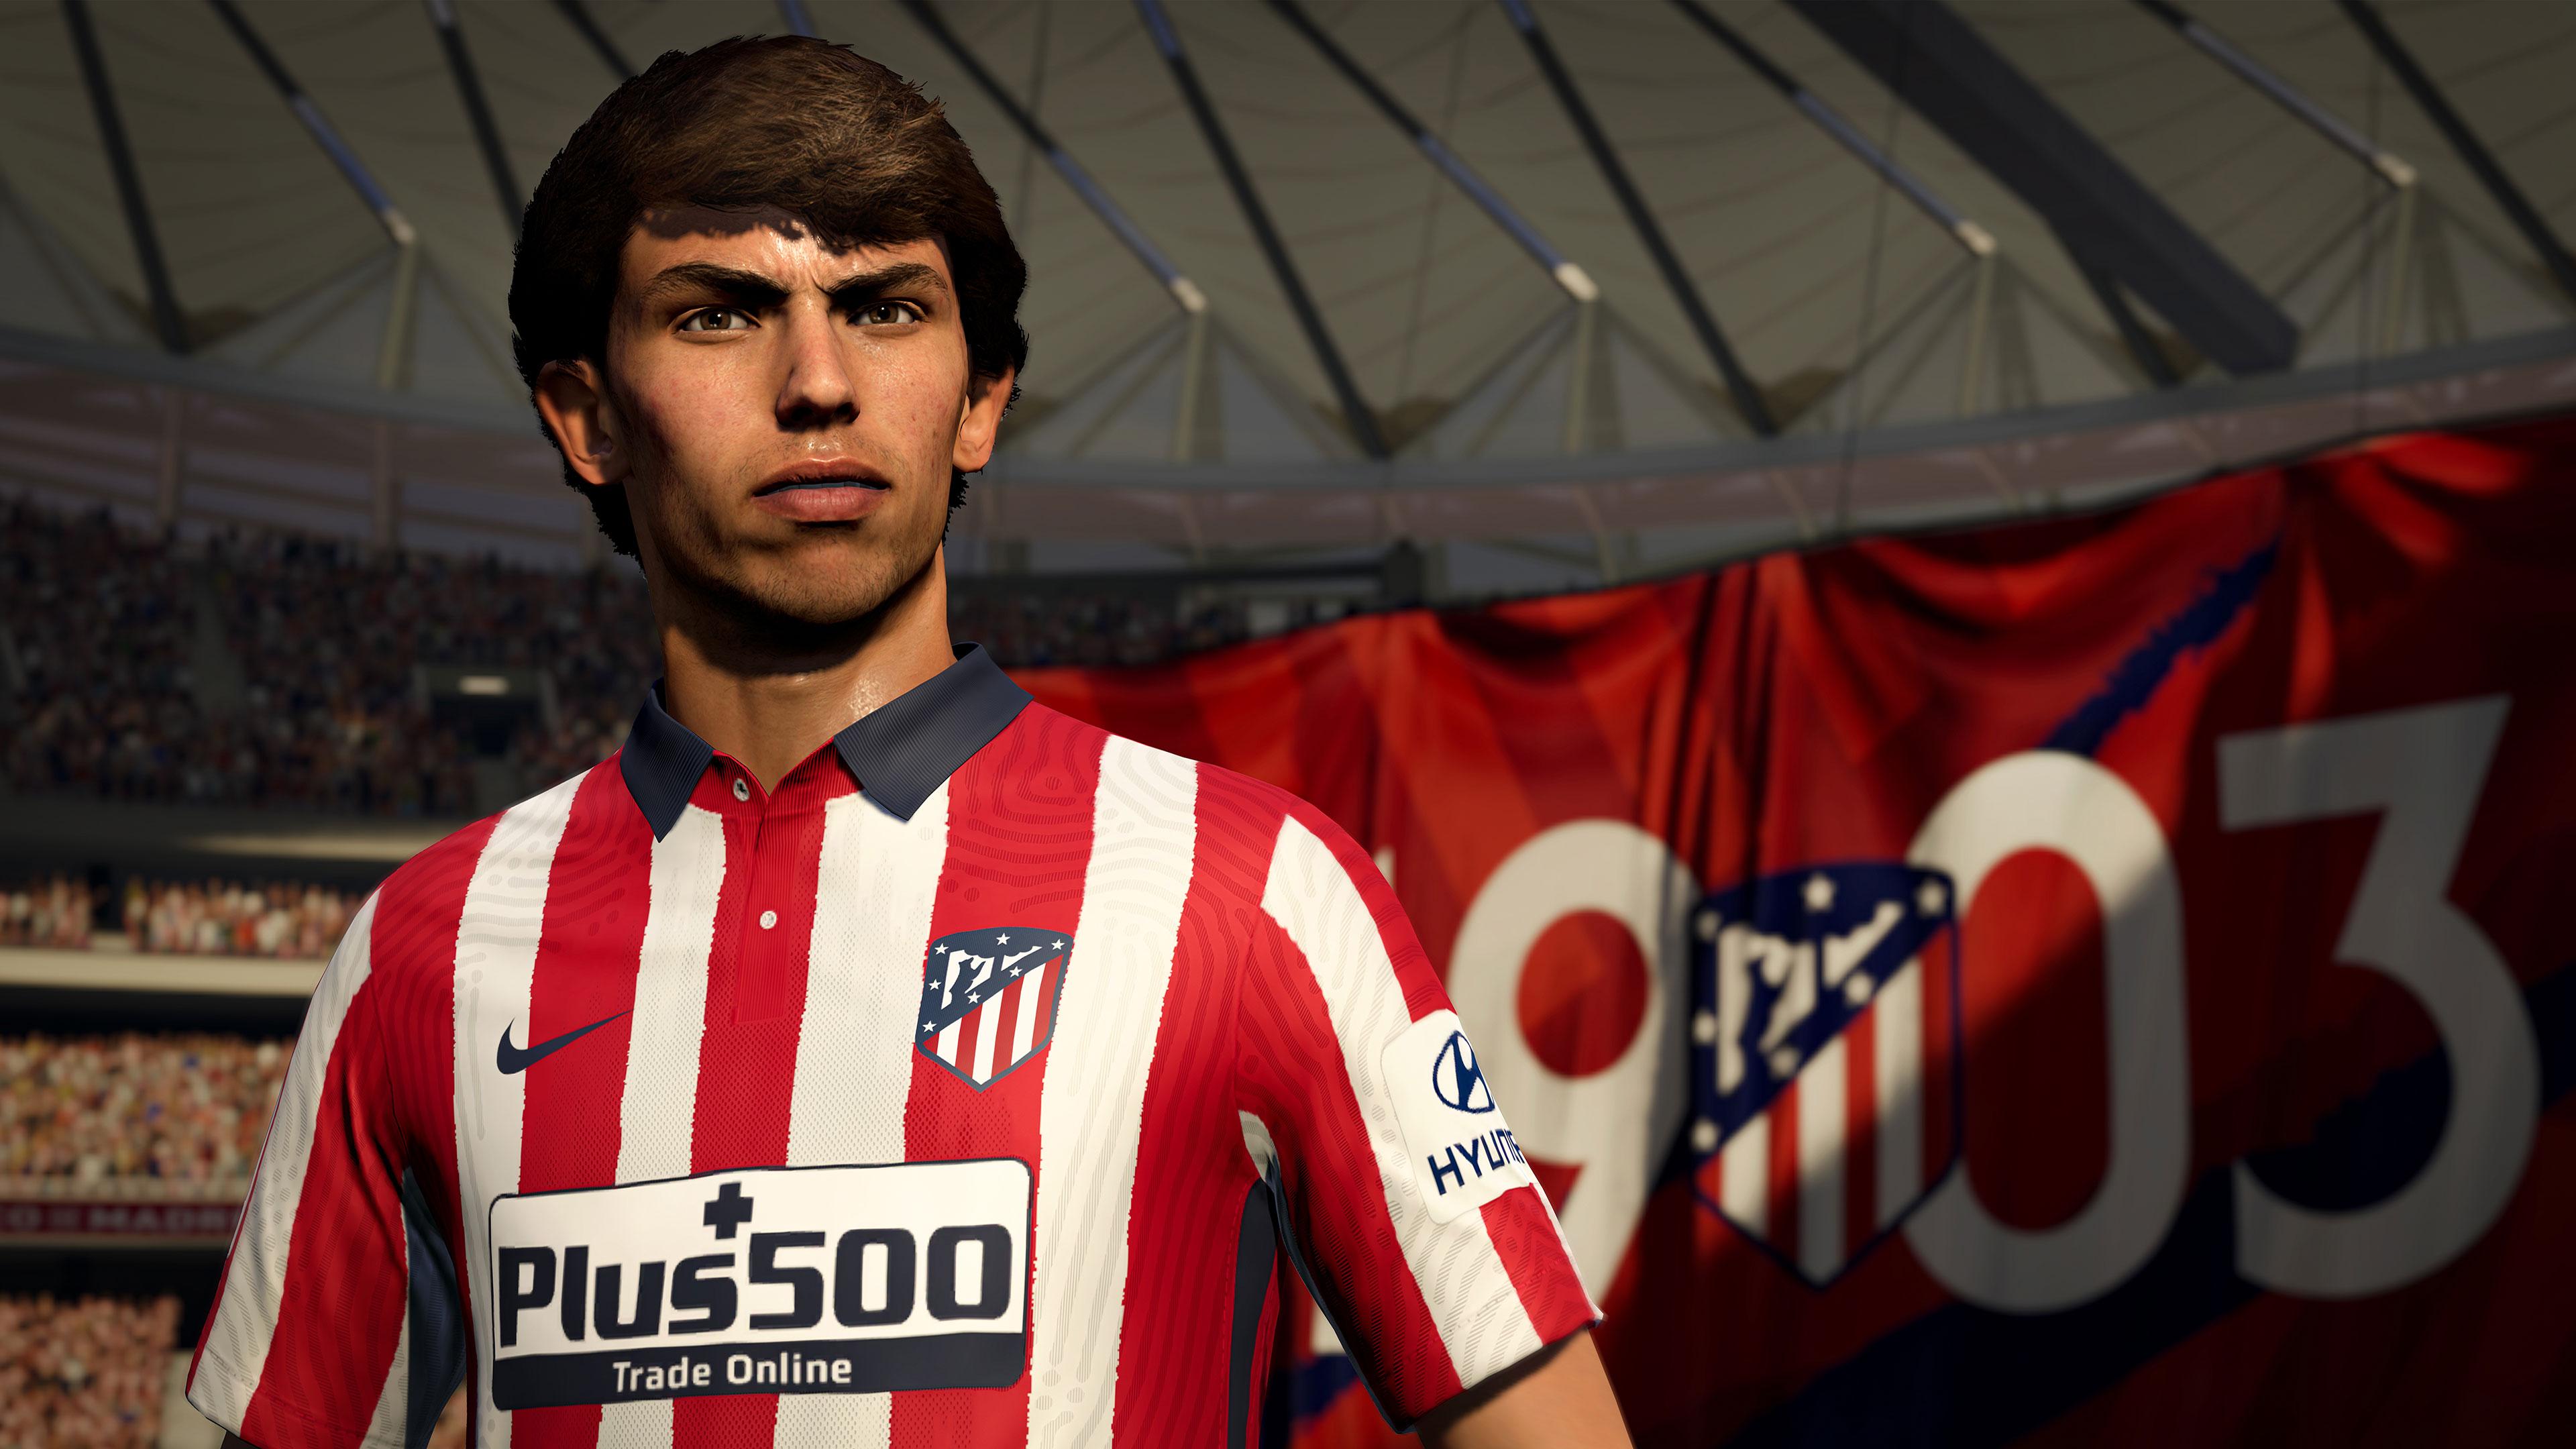 Скриншот №2 к FIFA 21 издание Champions PS4 and PS5